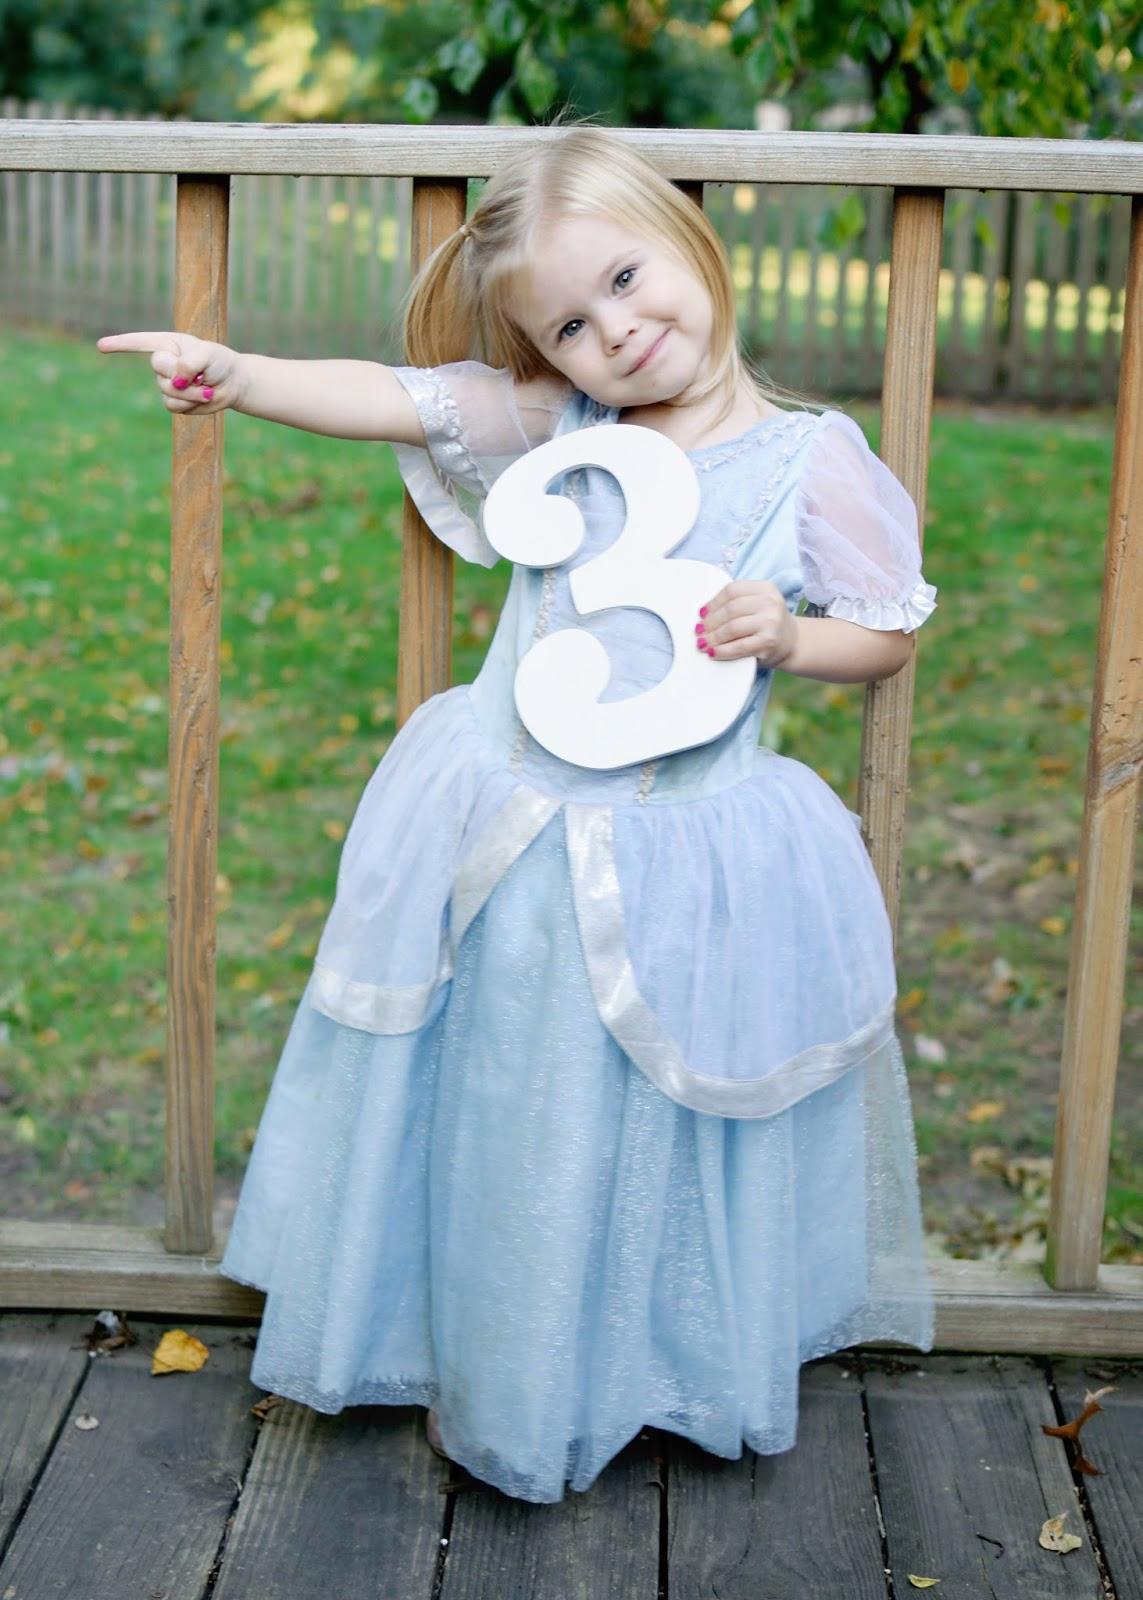 Ashley's Green Life: Mila's 3rd Birthday: A Halloween Party!